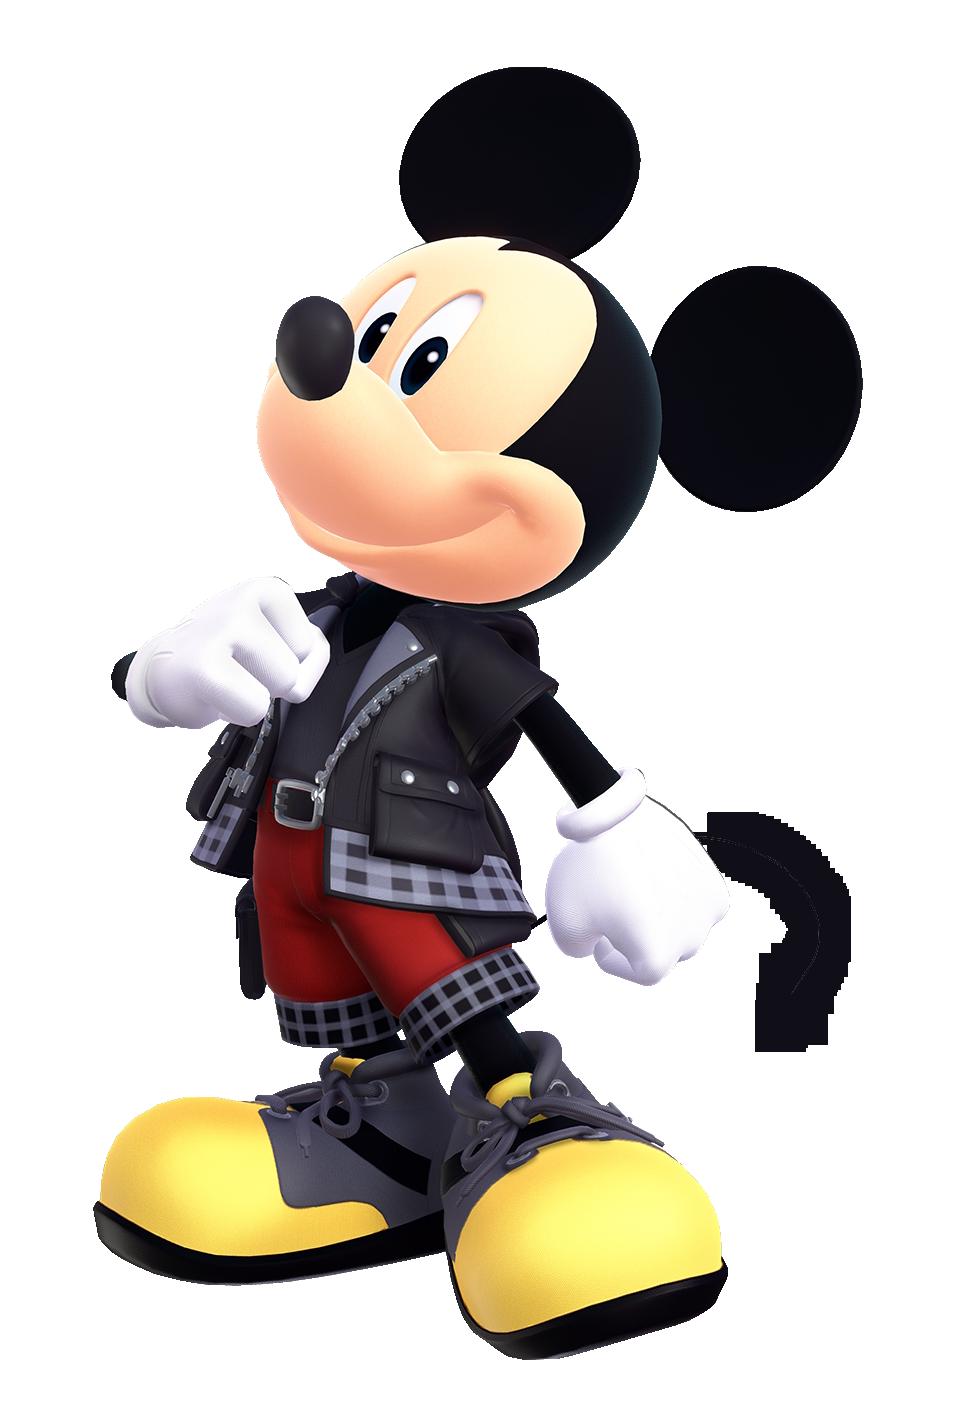 New Kingdom Hearts 3 Screenshots And Renders Released News